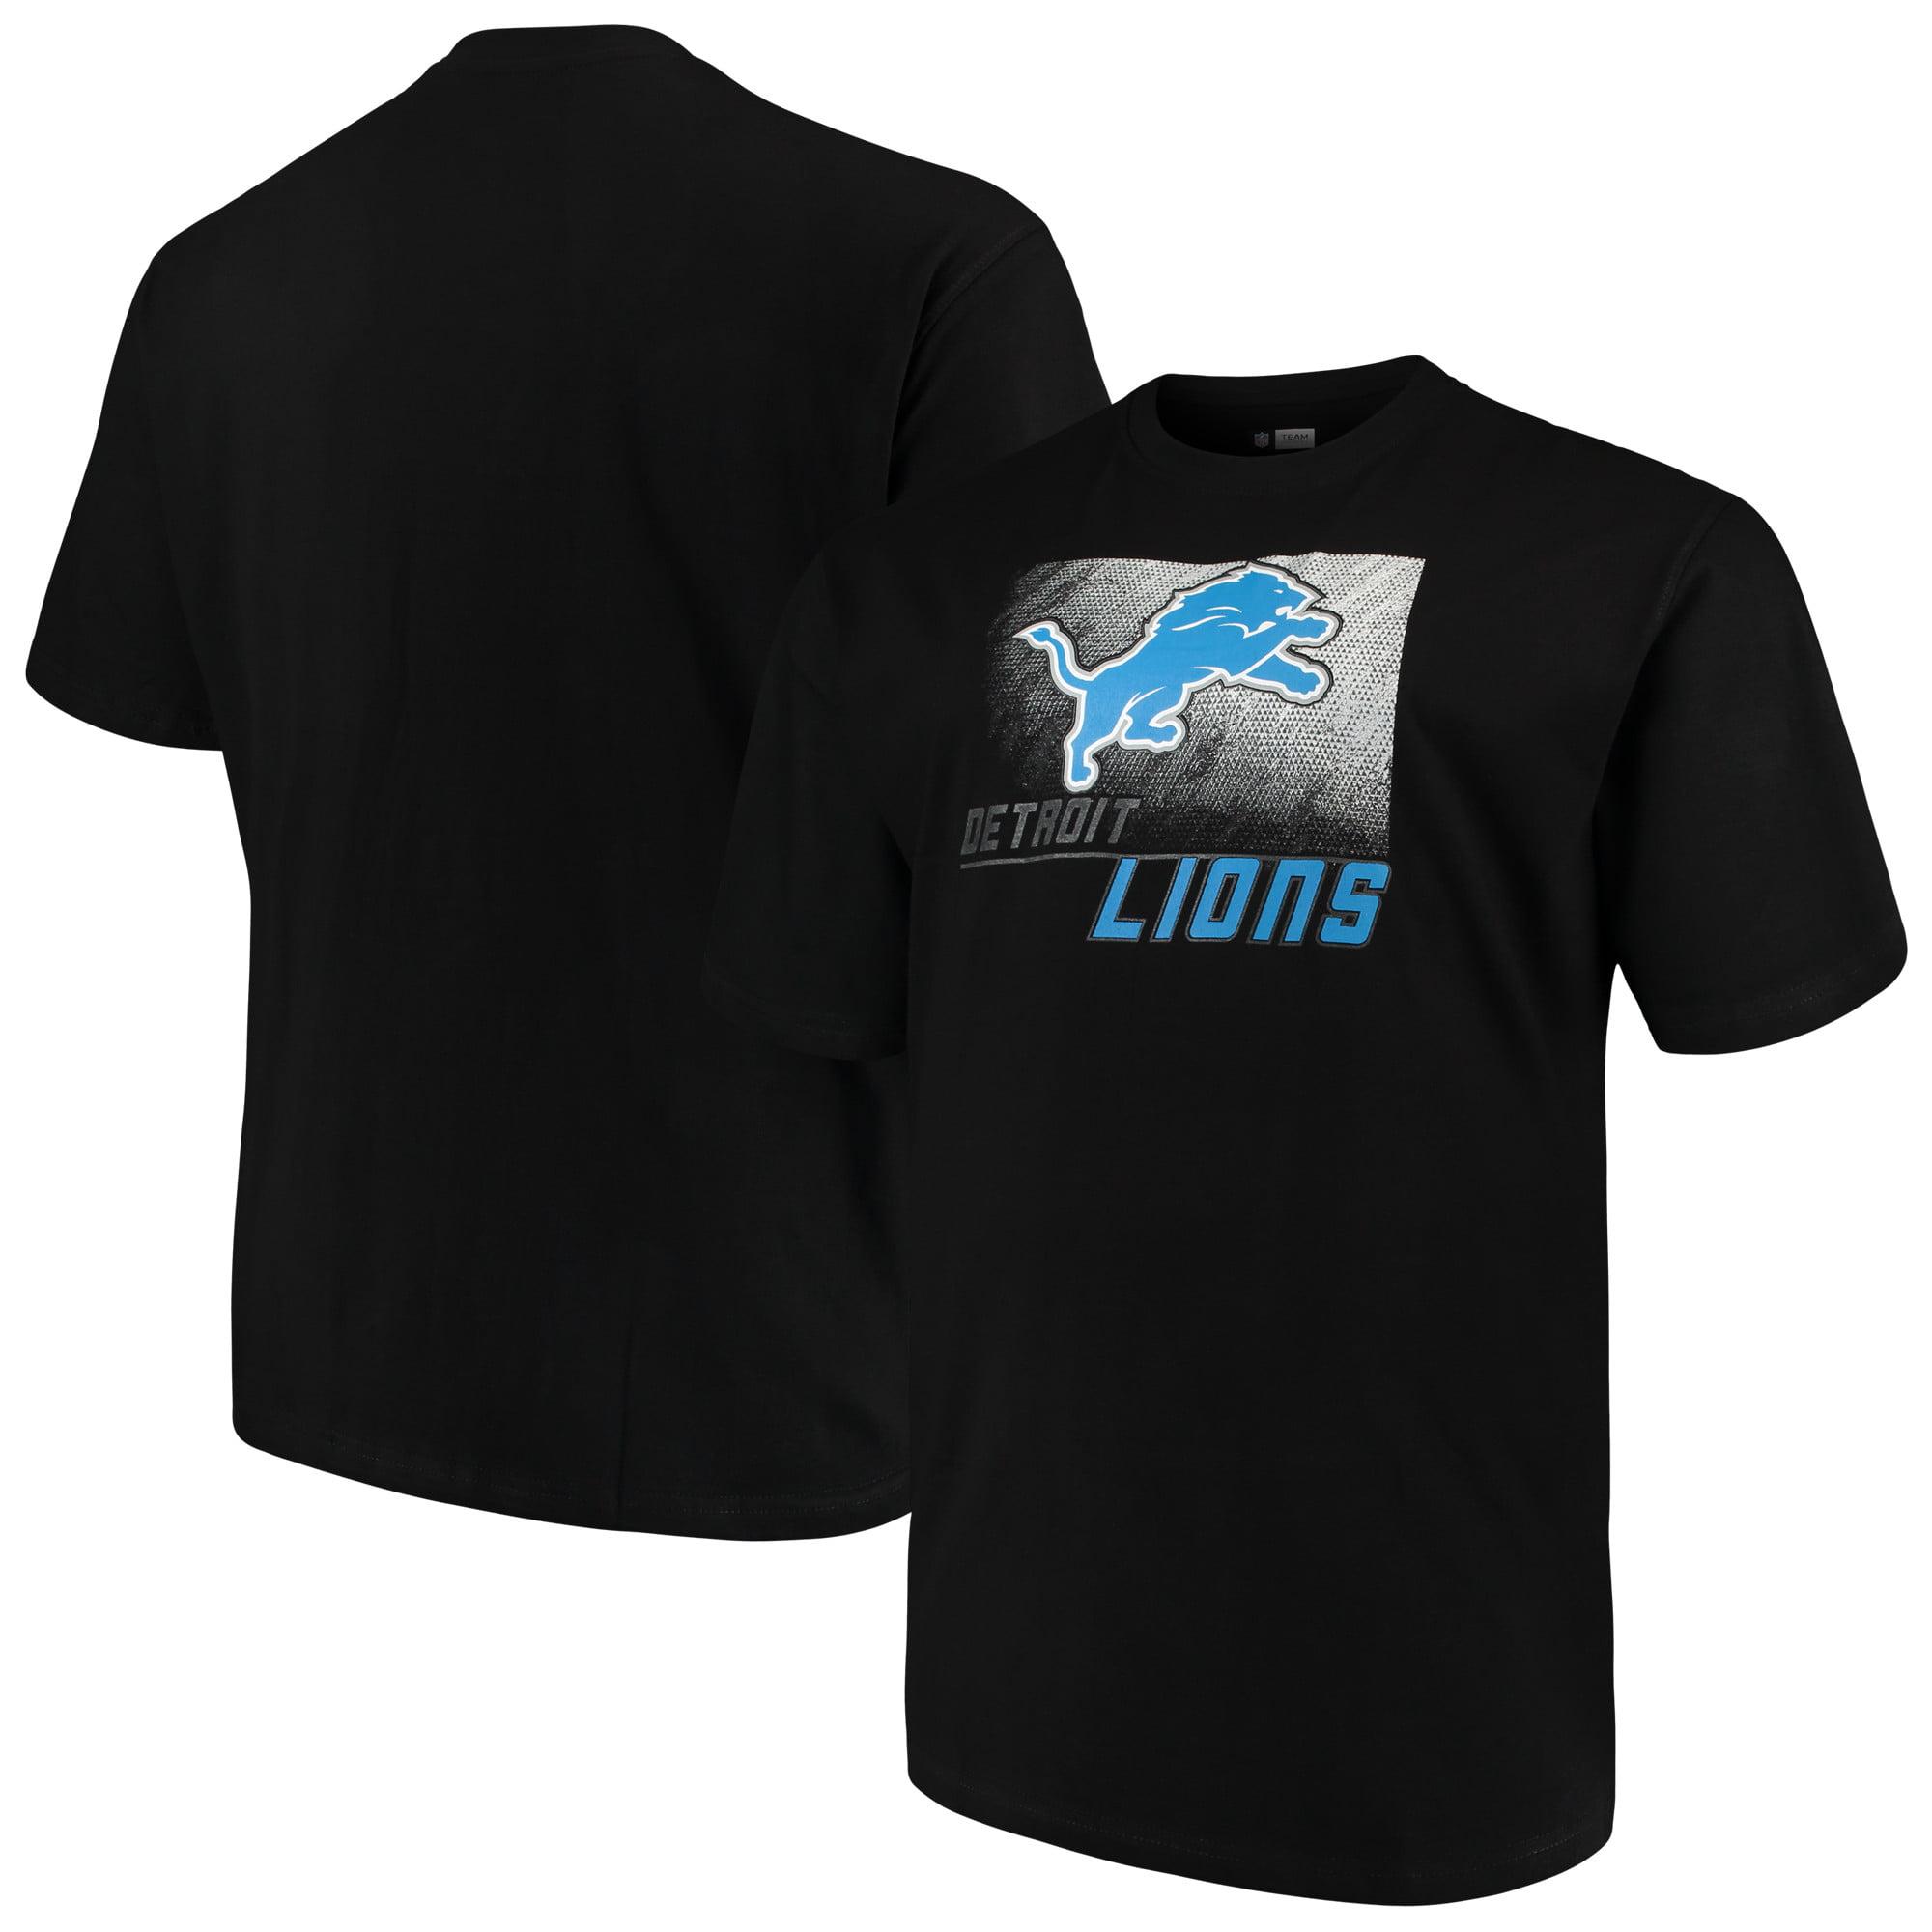 purchase cheap 944ec 9b0e5 Detroit Lions Team Shop - Walmart.com